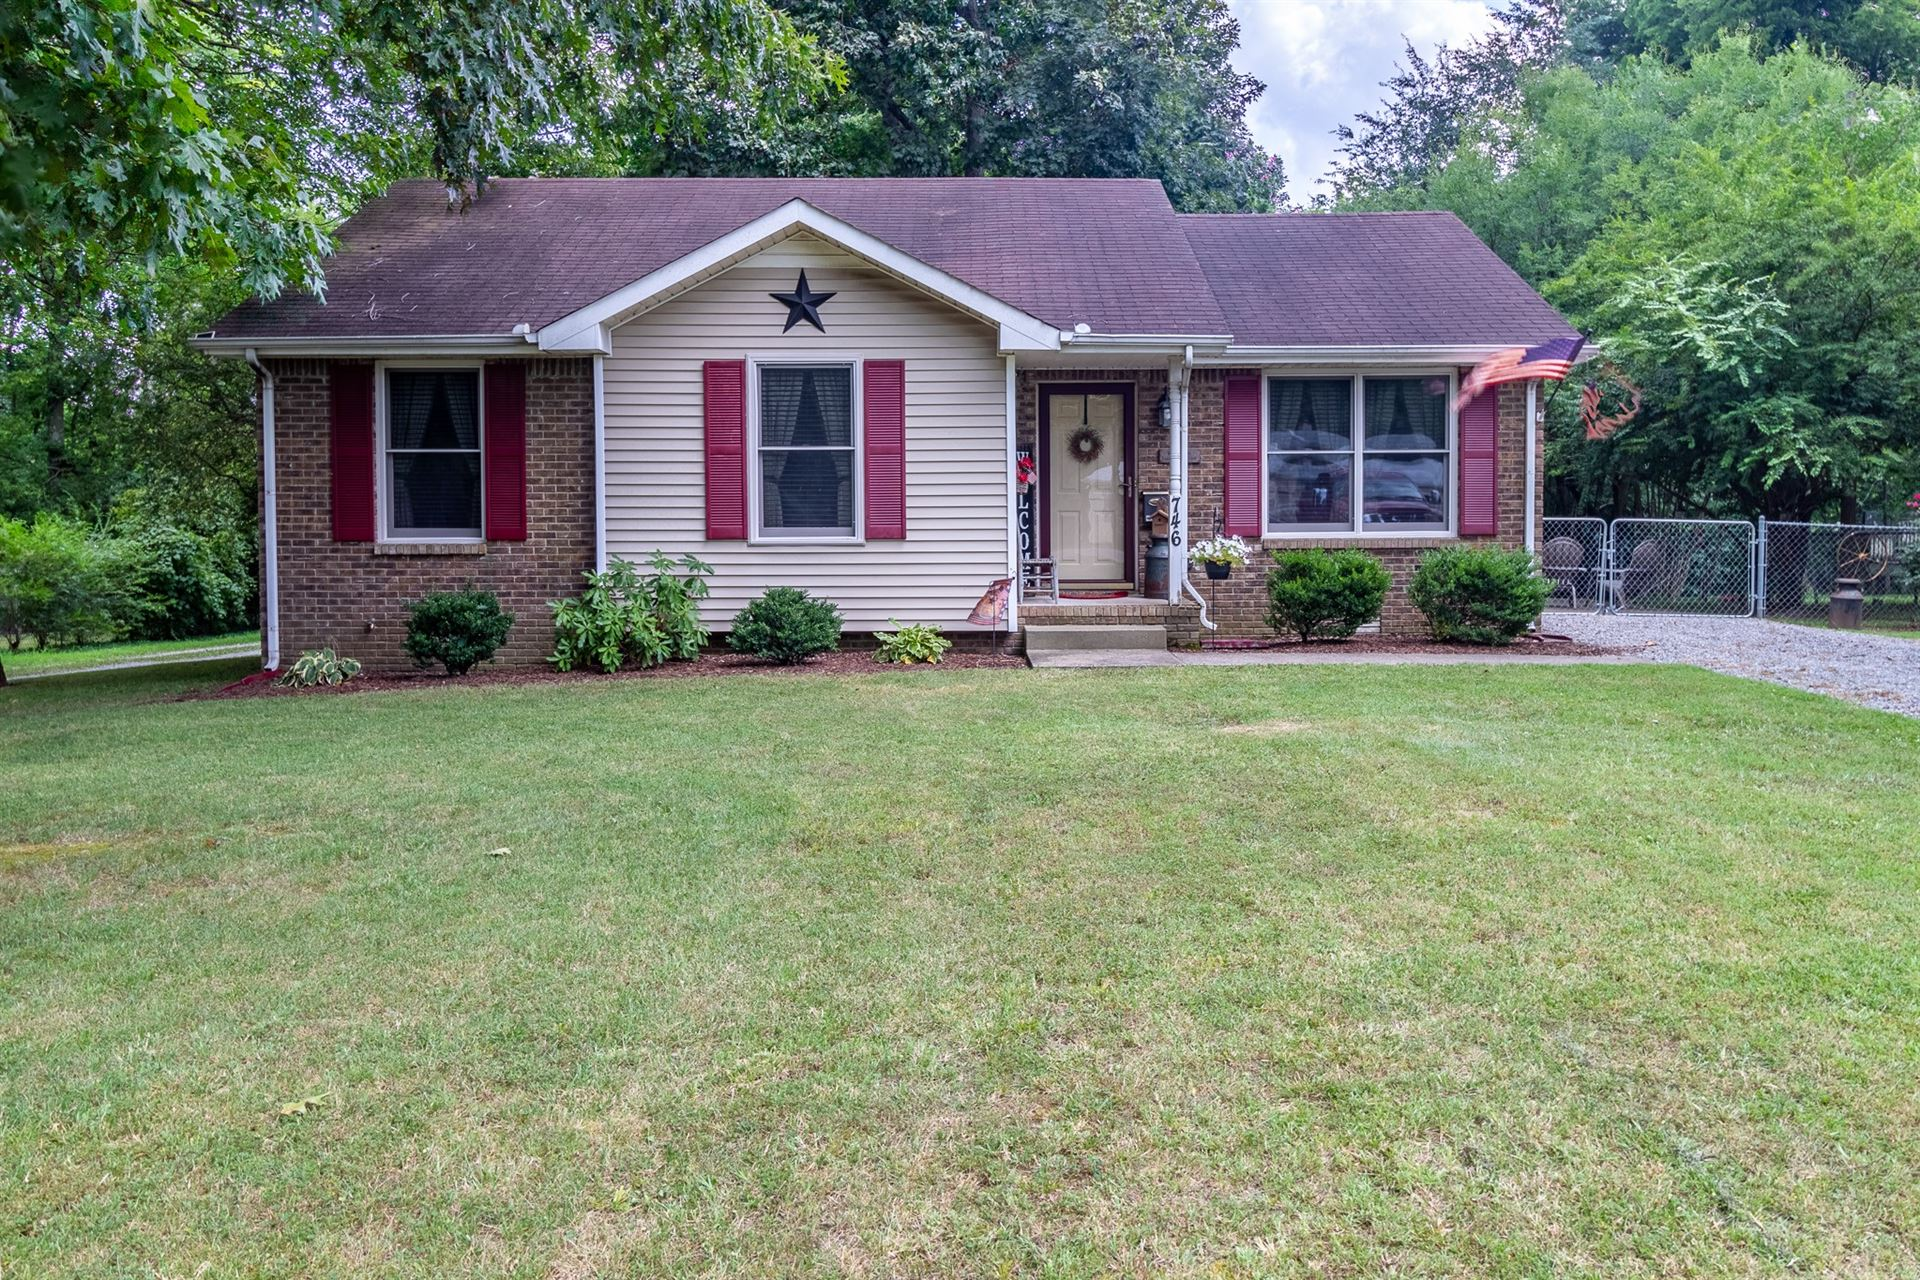 746 Needmore Rd, Clarksville, TN 37040 - MLS#: 2275795